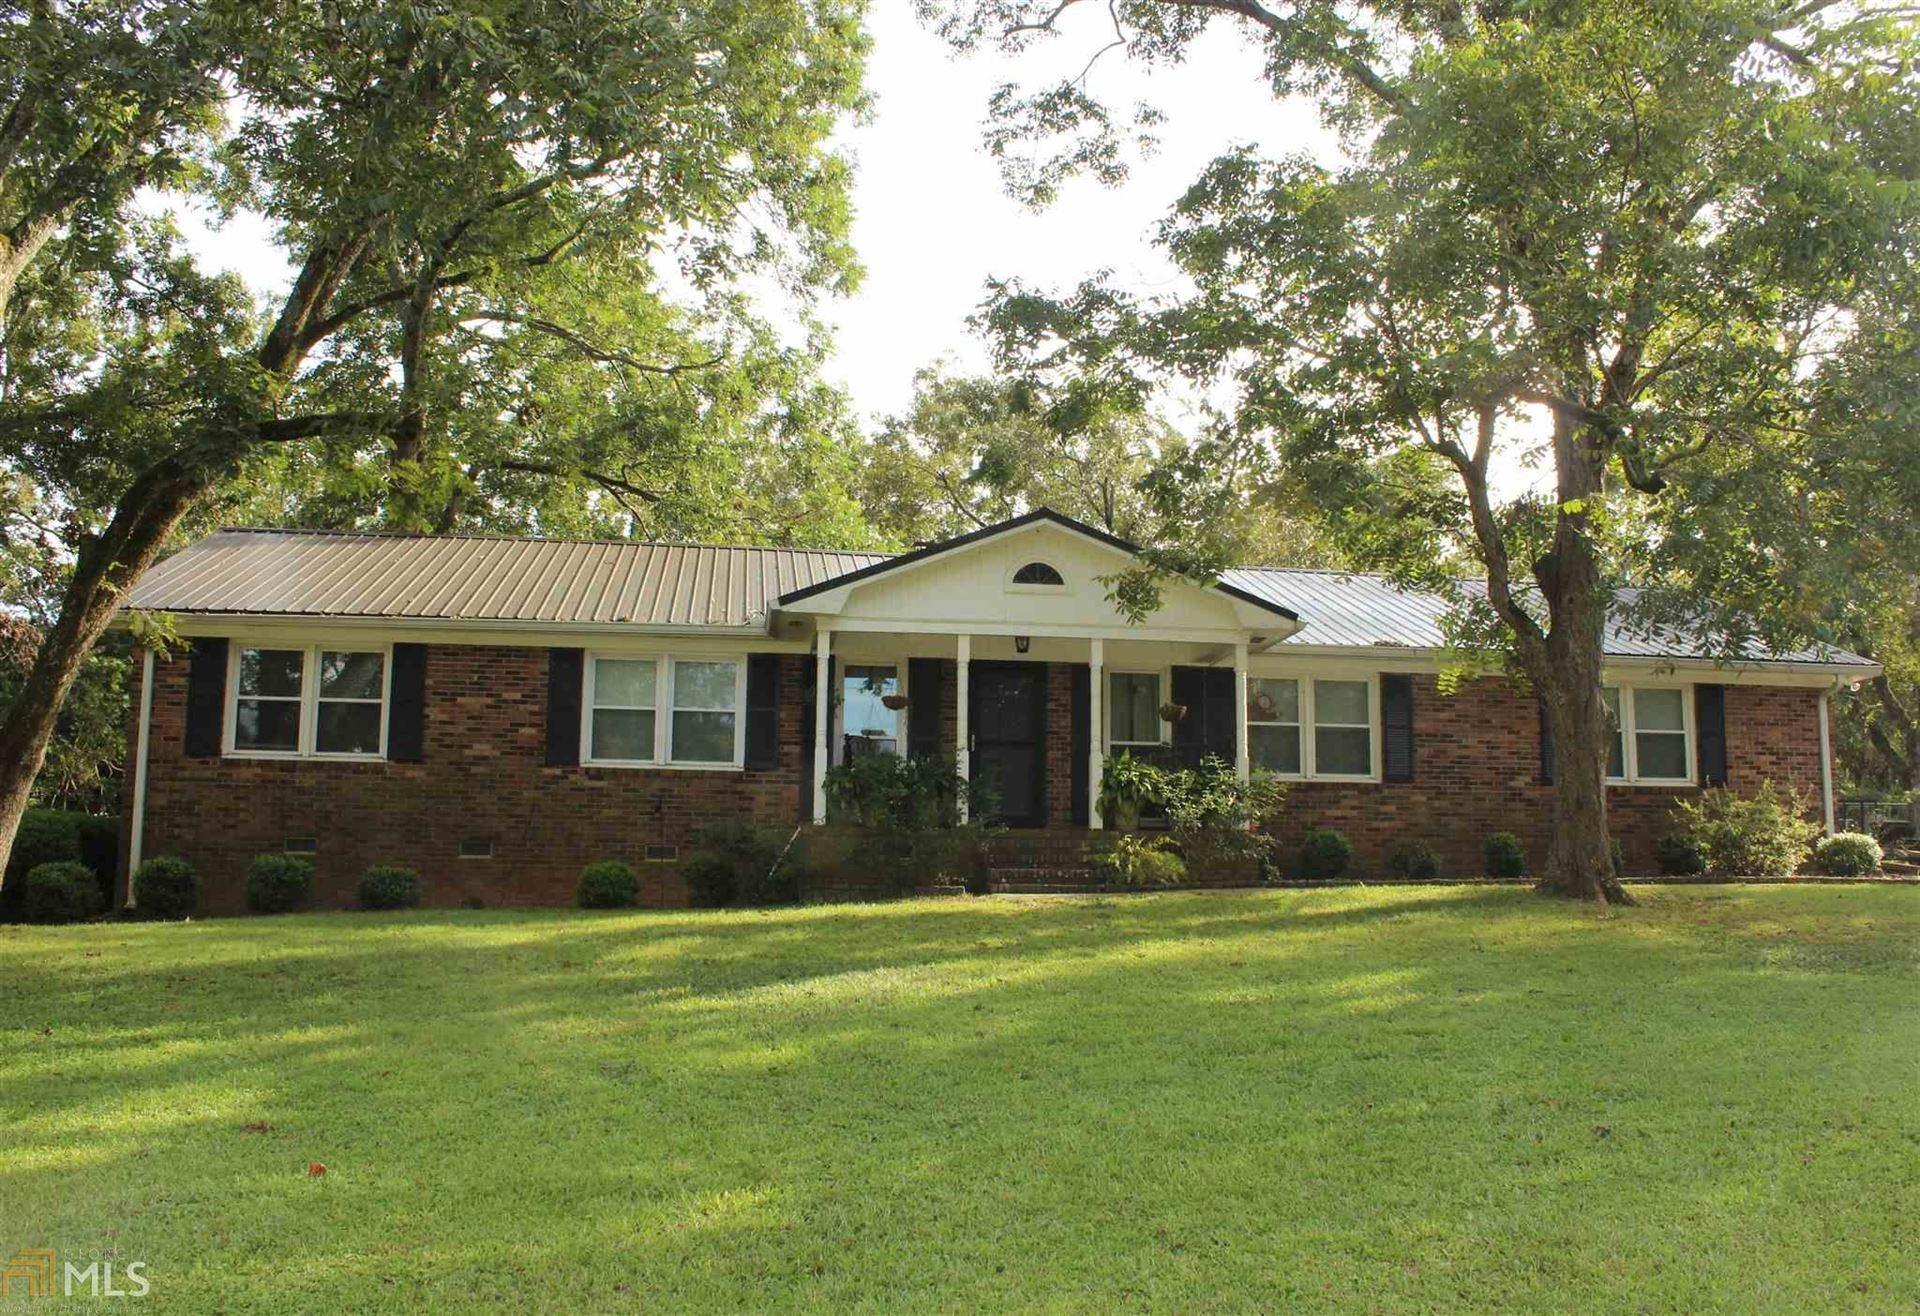 95 Maplewood Dr, Forsyth, GA 31029 - #: 8862805